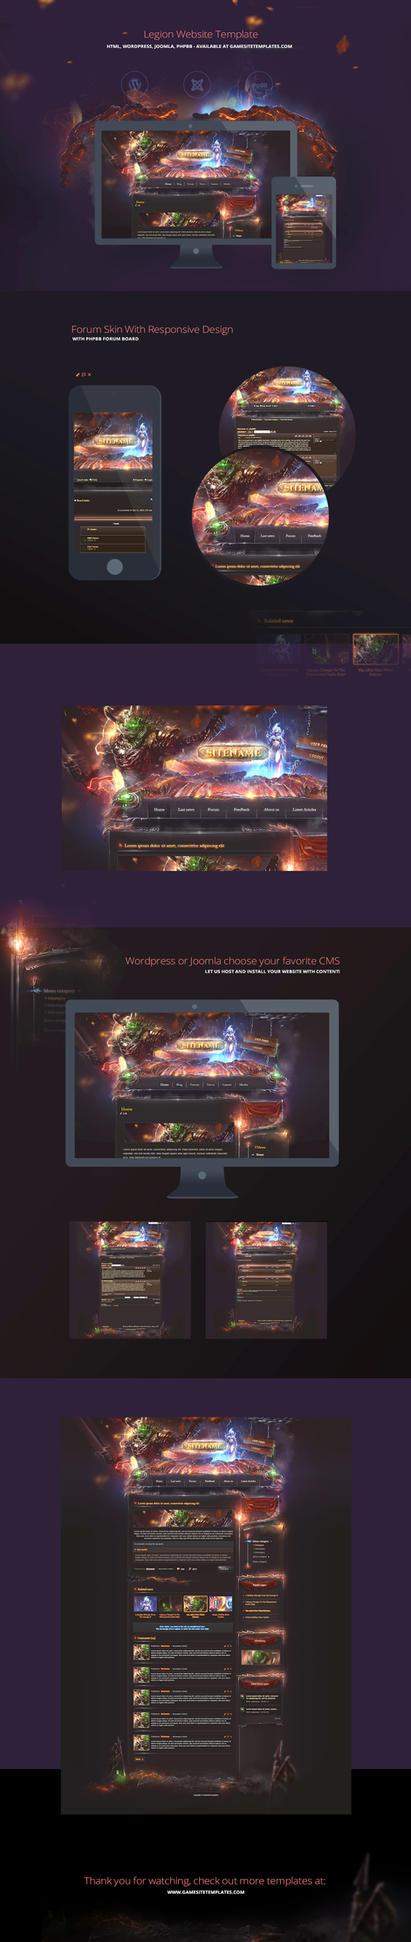 Legion Game Website Template by karsten